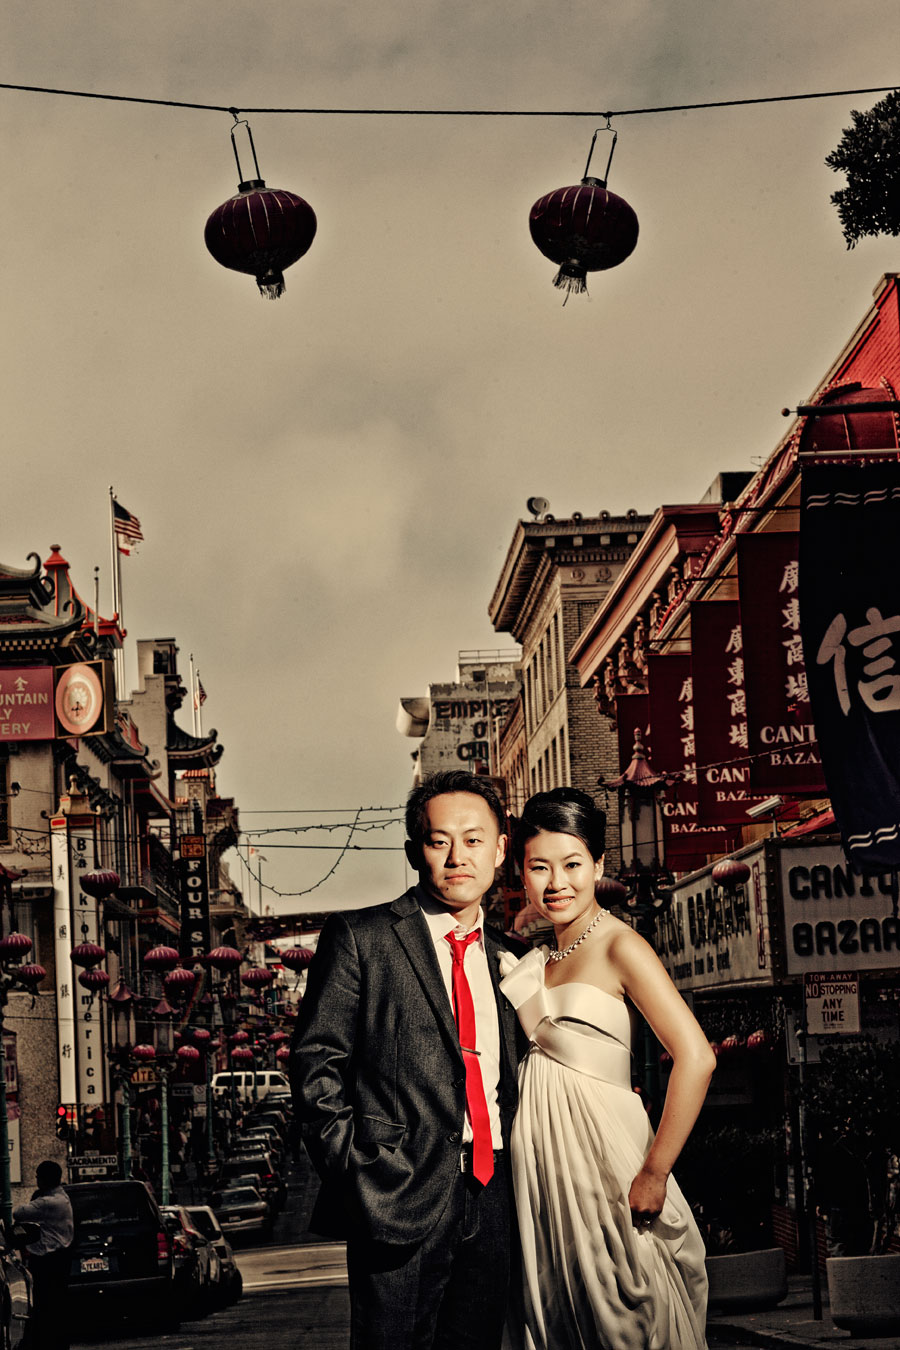 San Francisco Wedding Photographer » San Francisco City Hall Wedding